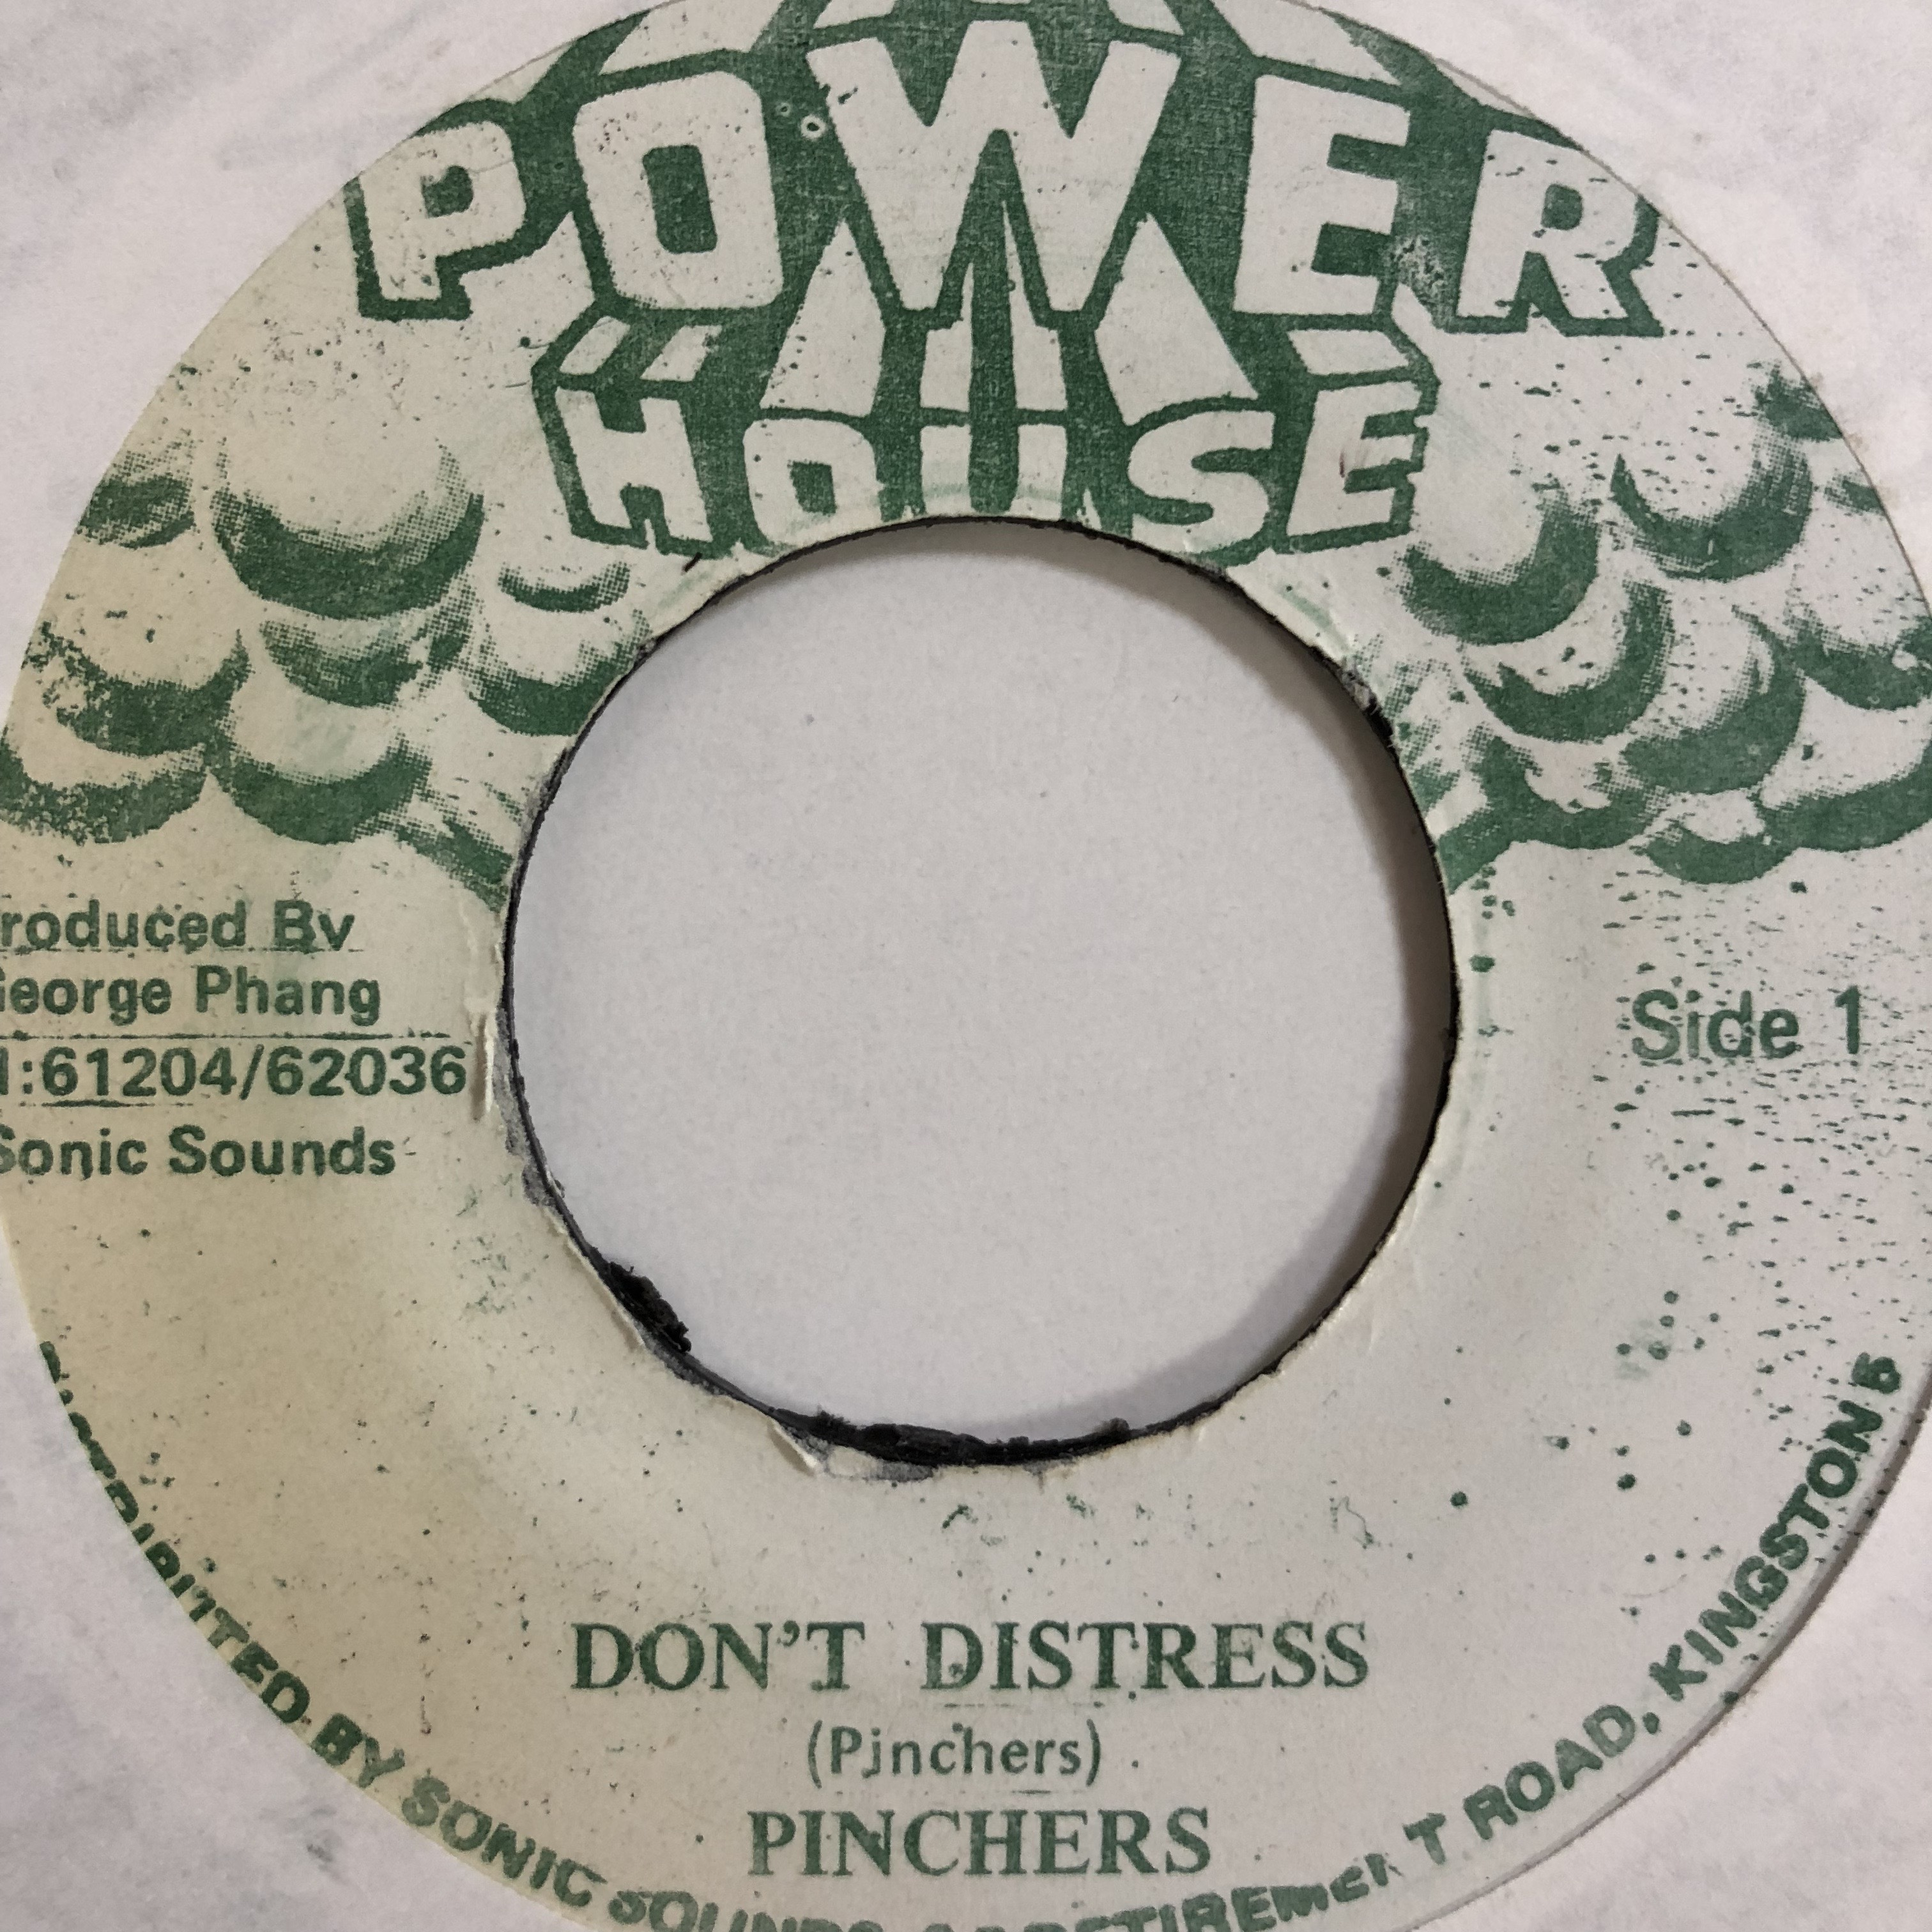 Pinchers(ピンチャーズ) - Don't Distress【7-10740】